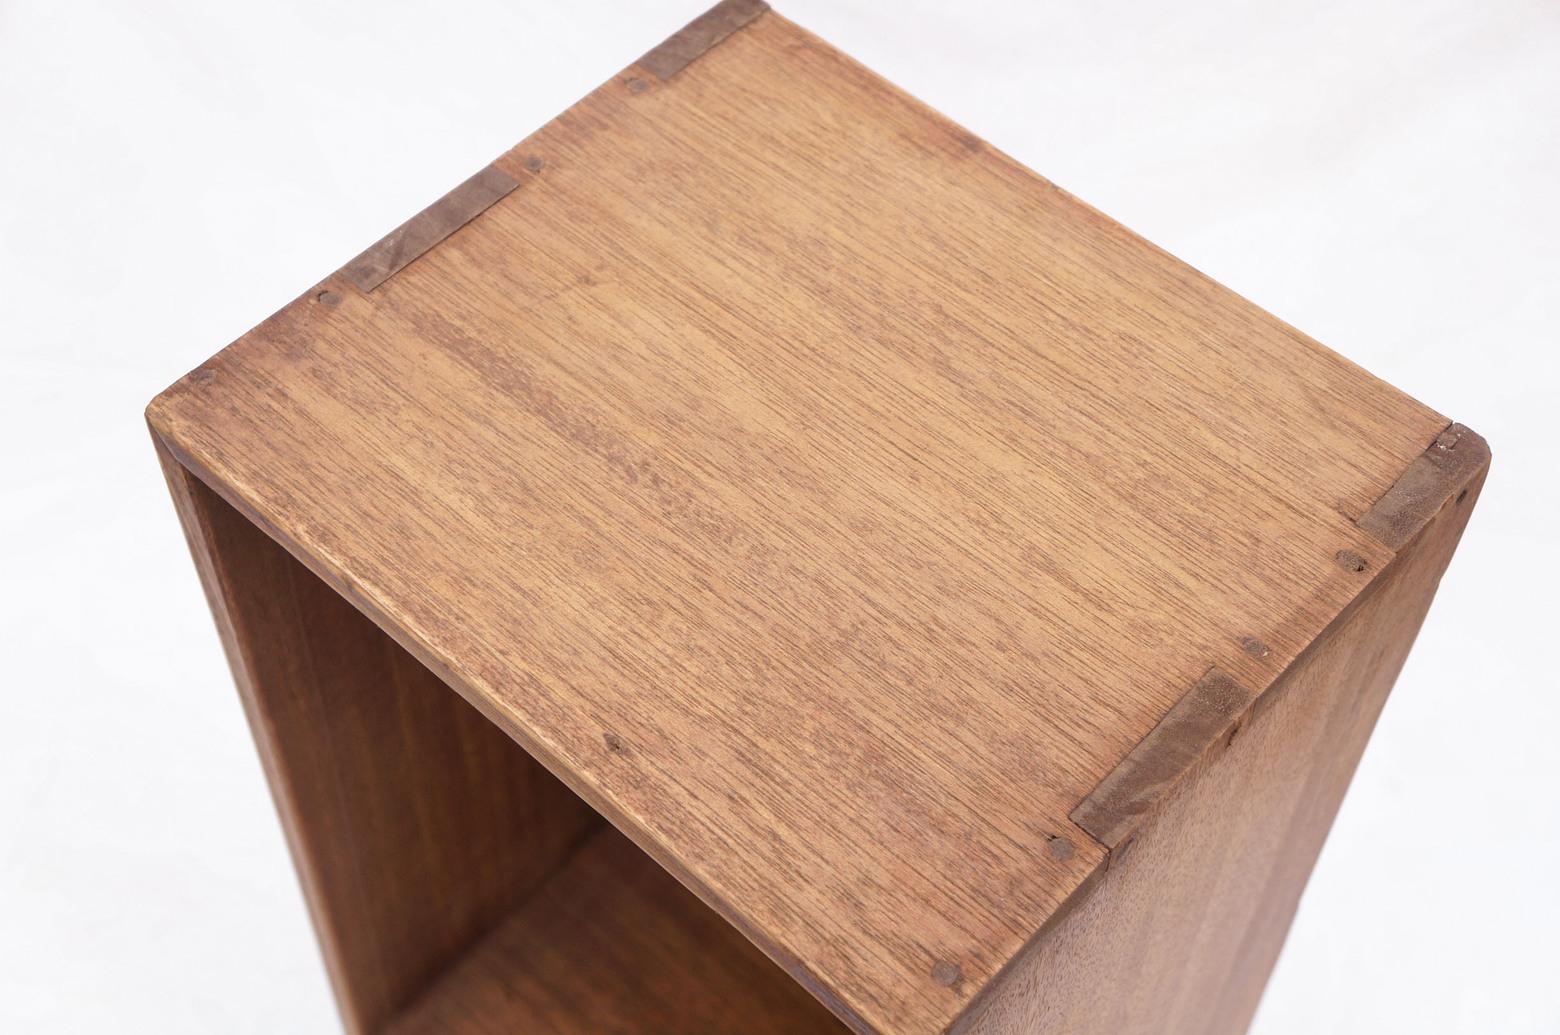 Japanese Vintage Wooden Box Shelf/ジャパンヴィンテージ ボックスシェルフ 木箱 収納ボックス レトロ シャビー 小 7